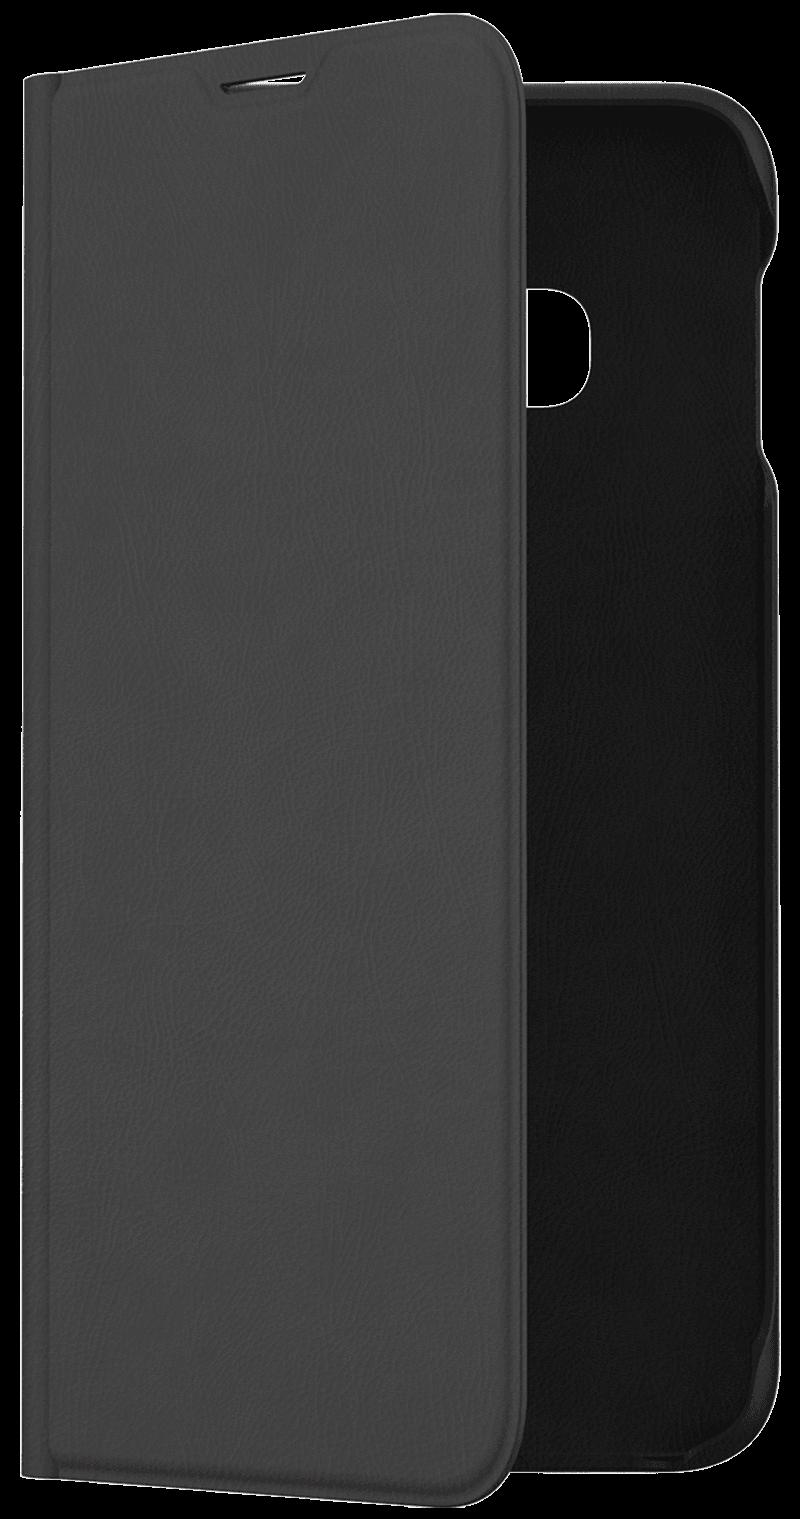 Etui folio Galaxy S10e noir